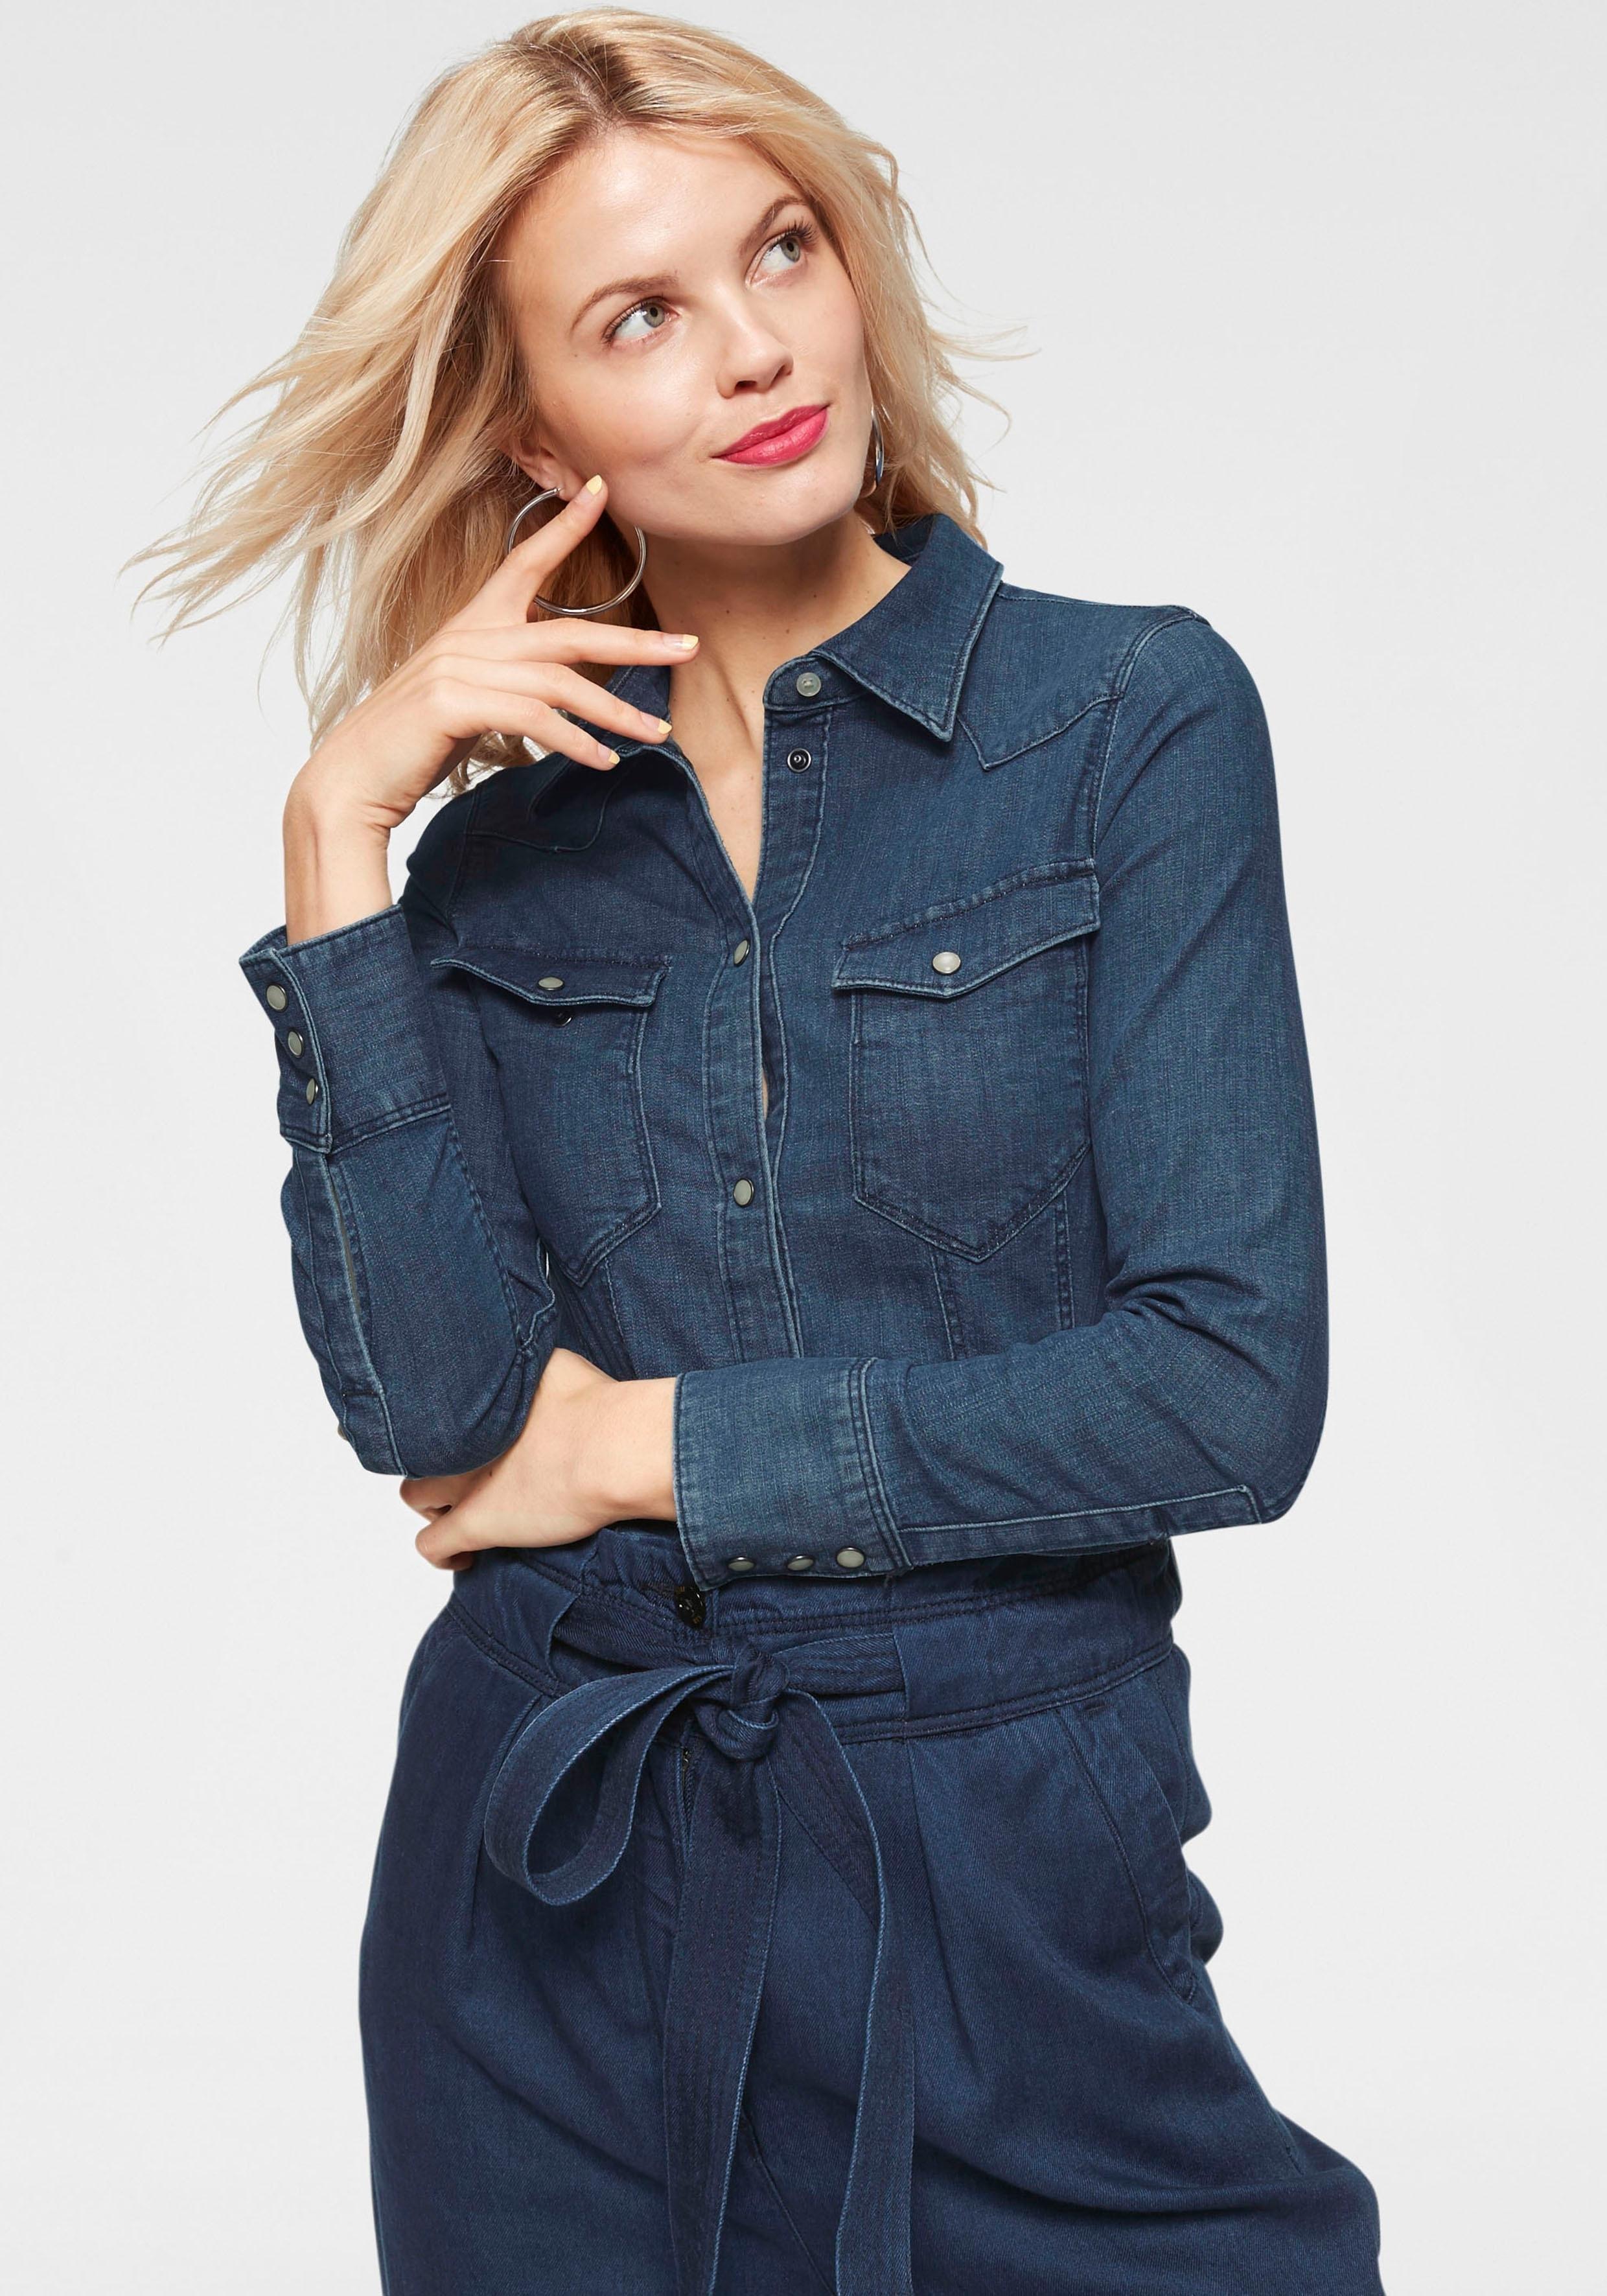 G-star Raw jeansblouse »Tacoma slim shirt wmn l/s« voordelig en veilig online kopen